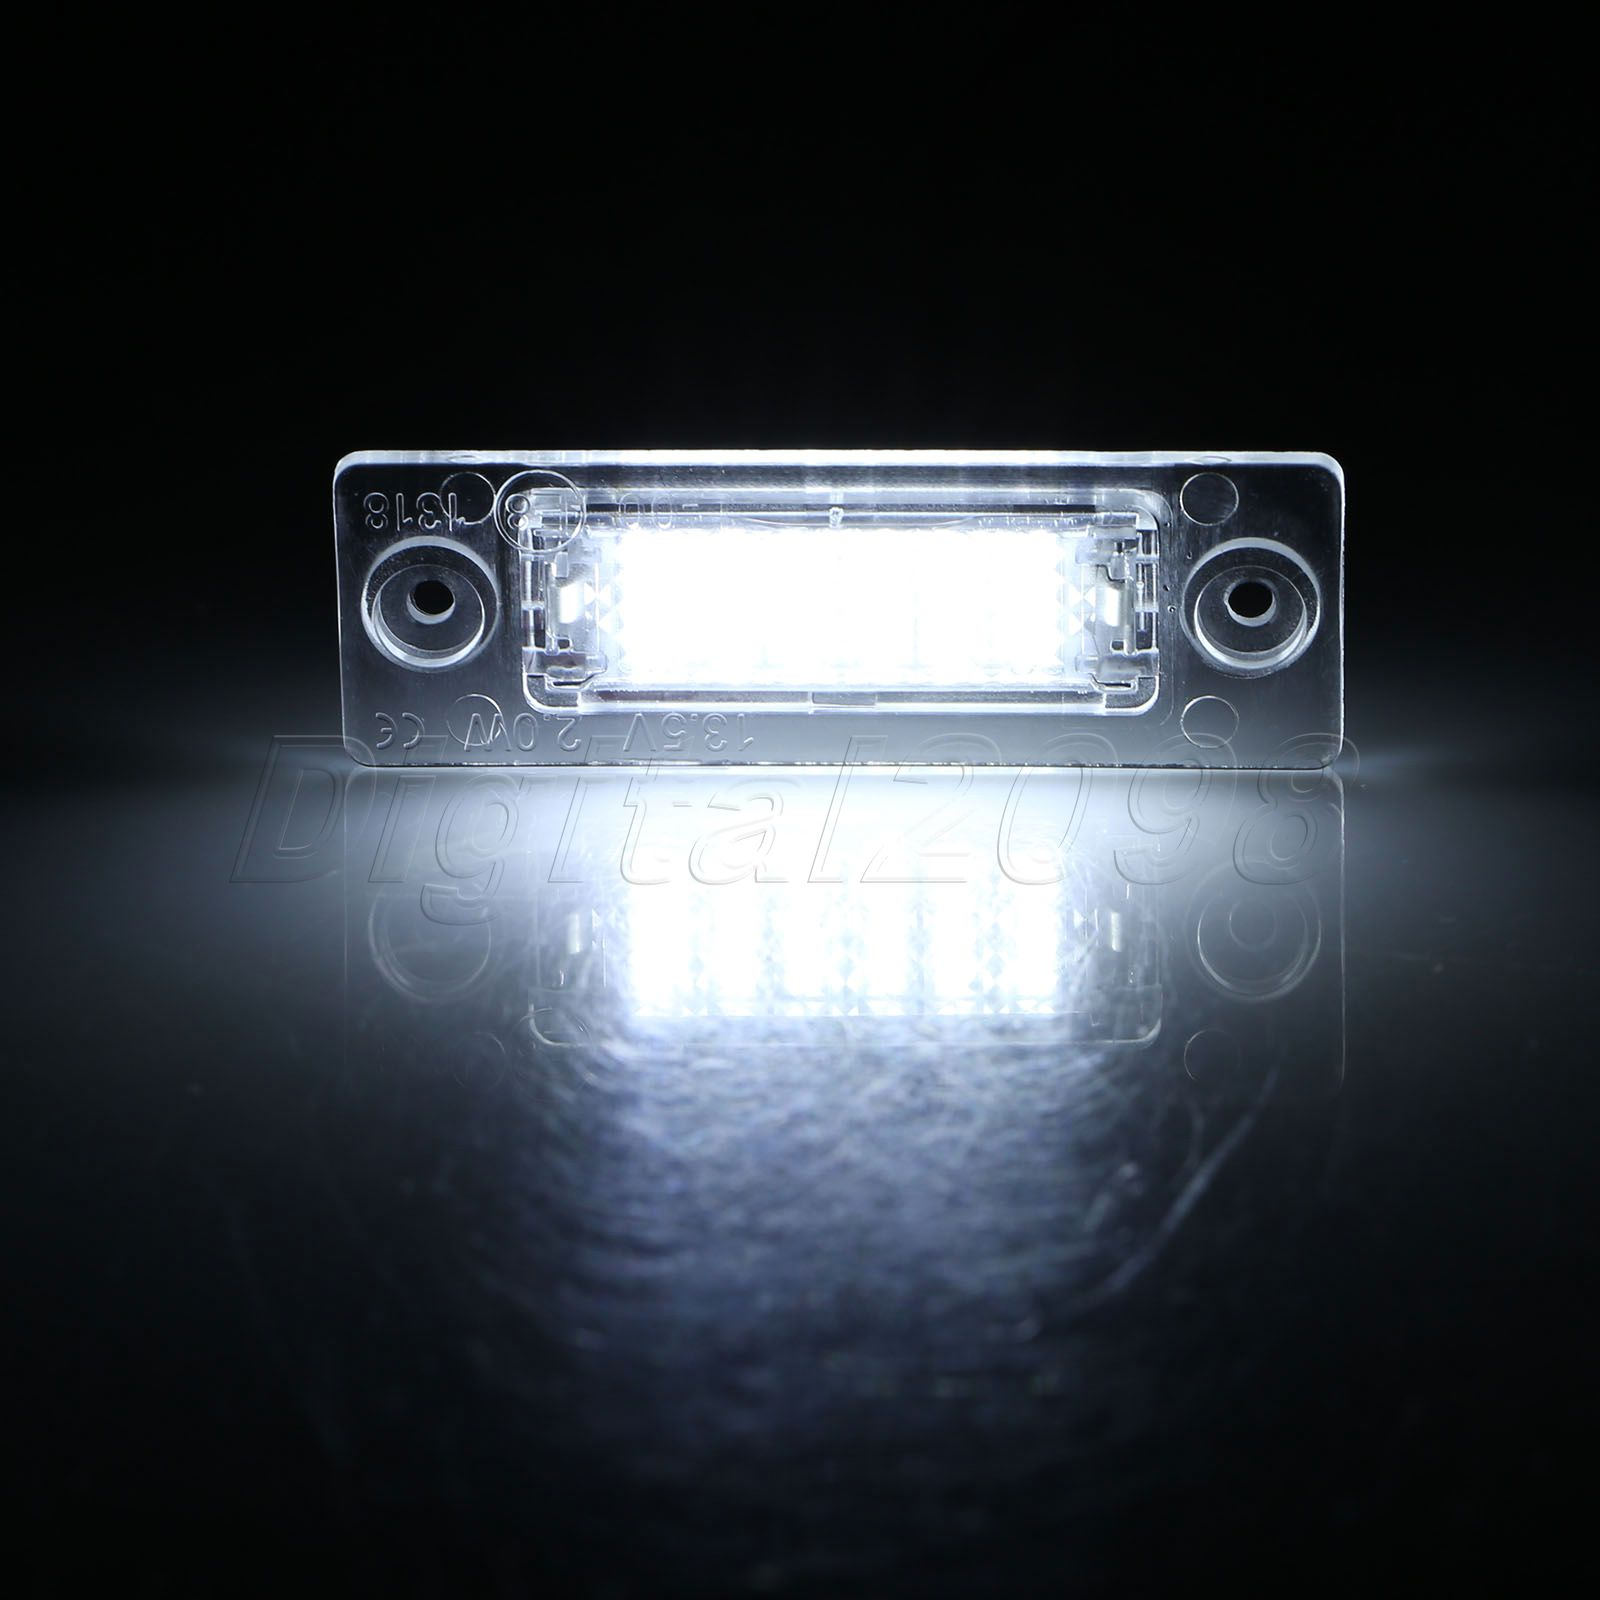 Yetaha 2x LED License Number Plate Light Bulb Lamp for VW Caddy Golf 5 Plus Jetta 5 Passat Touran Transporter T5 Skoda Superb lola rose ожерелье